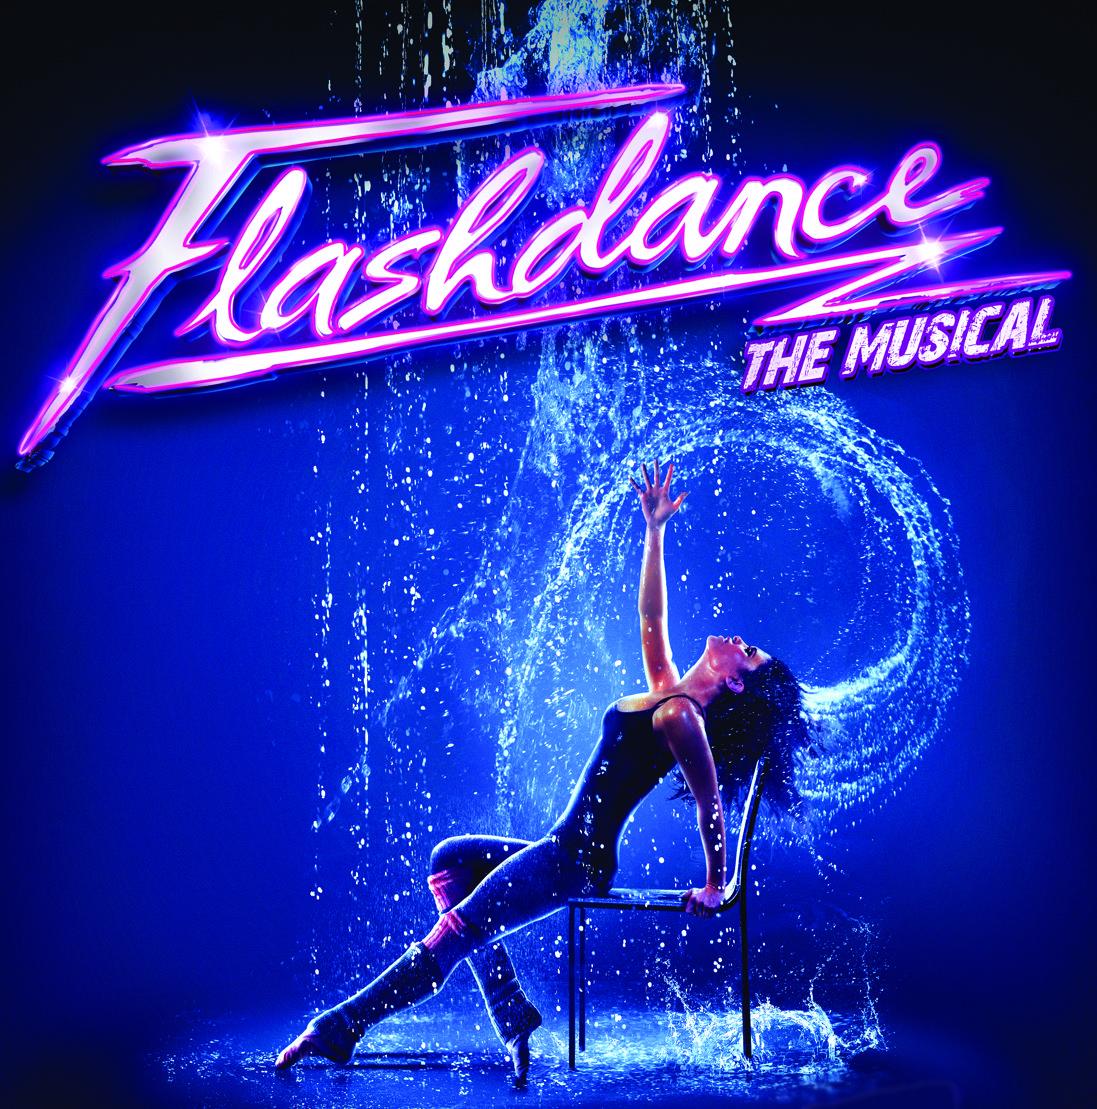 Flashdance the Musical Musicals, Flashdance, Musical theatre